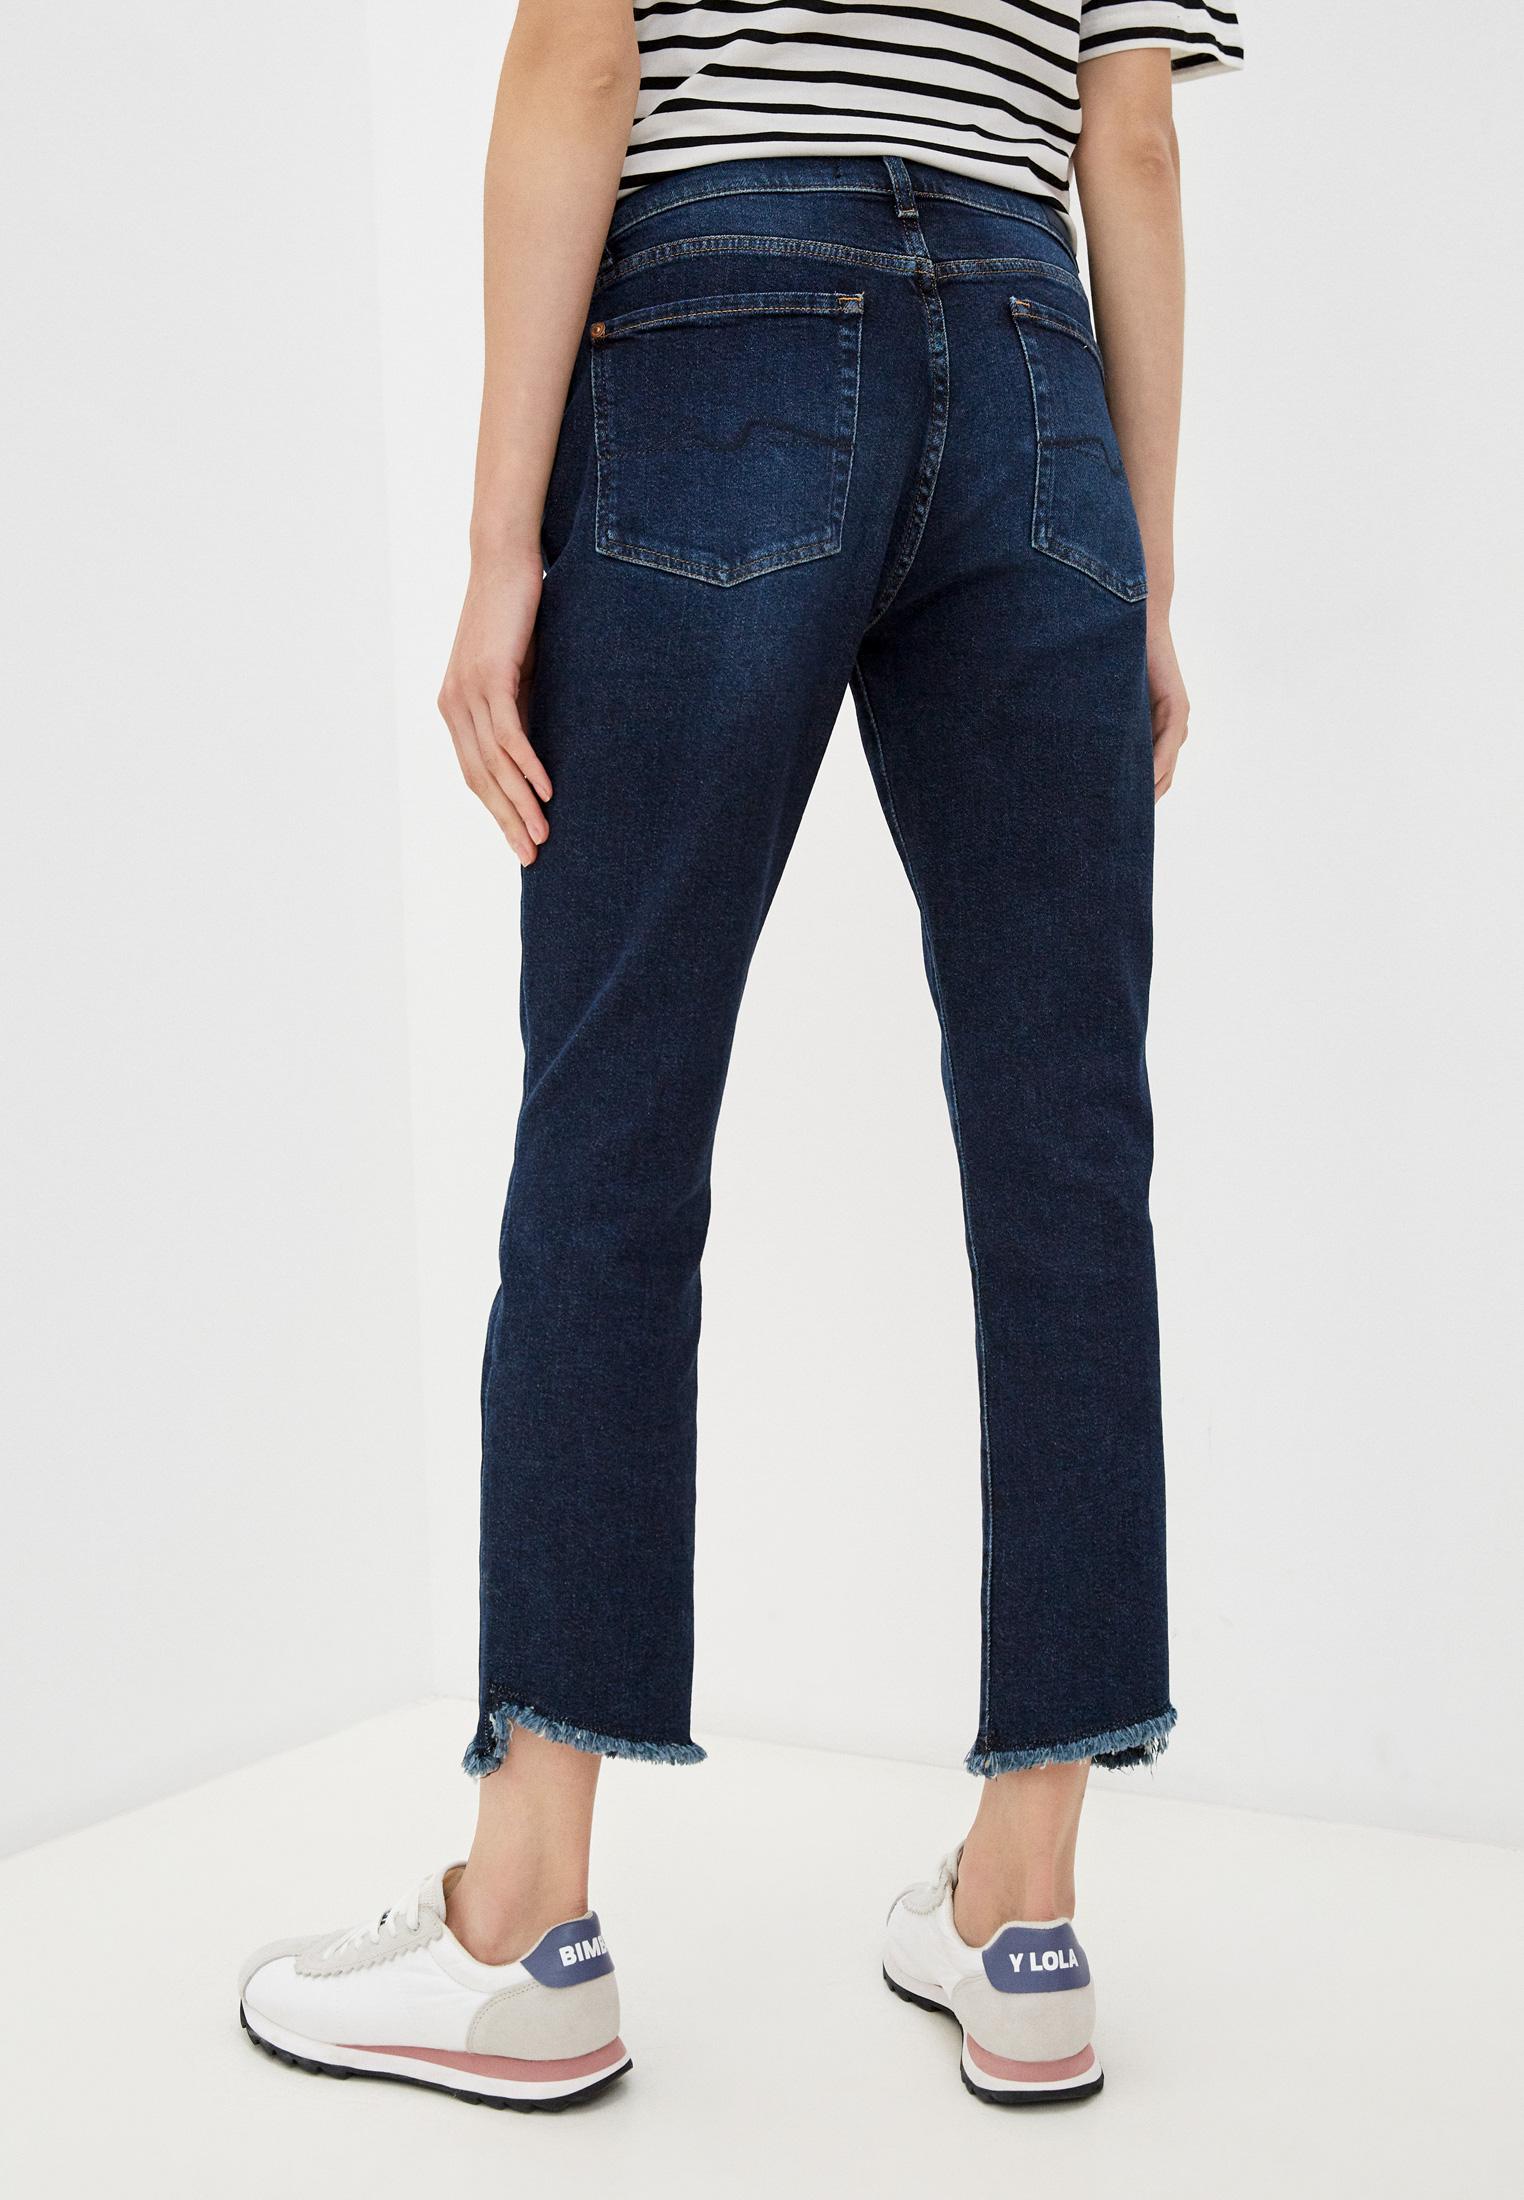 Зауженные джинсы 7 For All Mankind (7 Фо Олл Мэнкайнд) JSDSA910VH: изображение 4